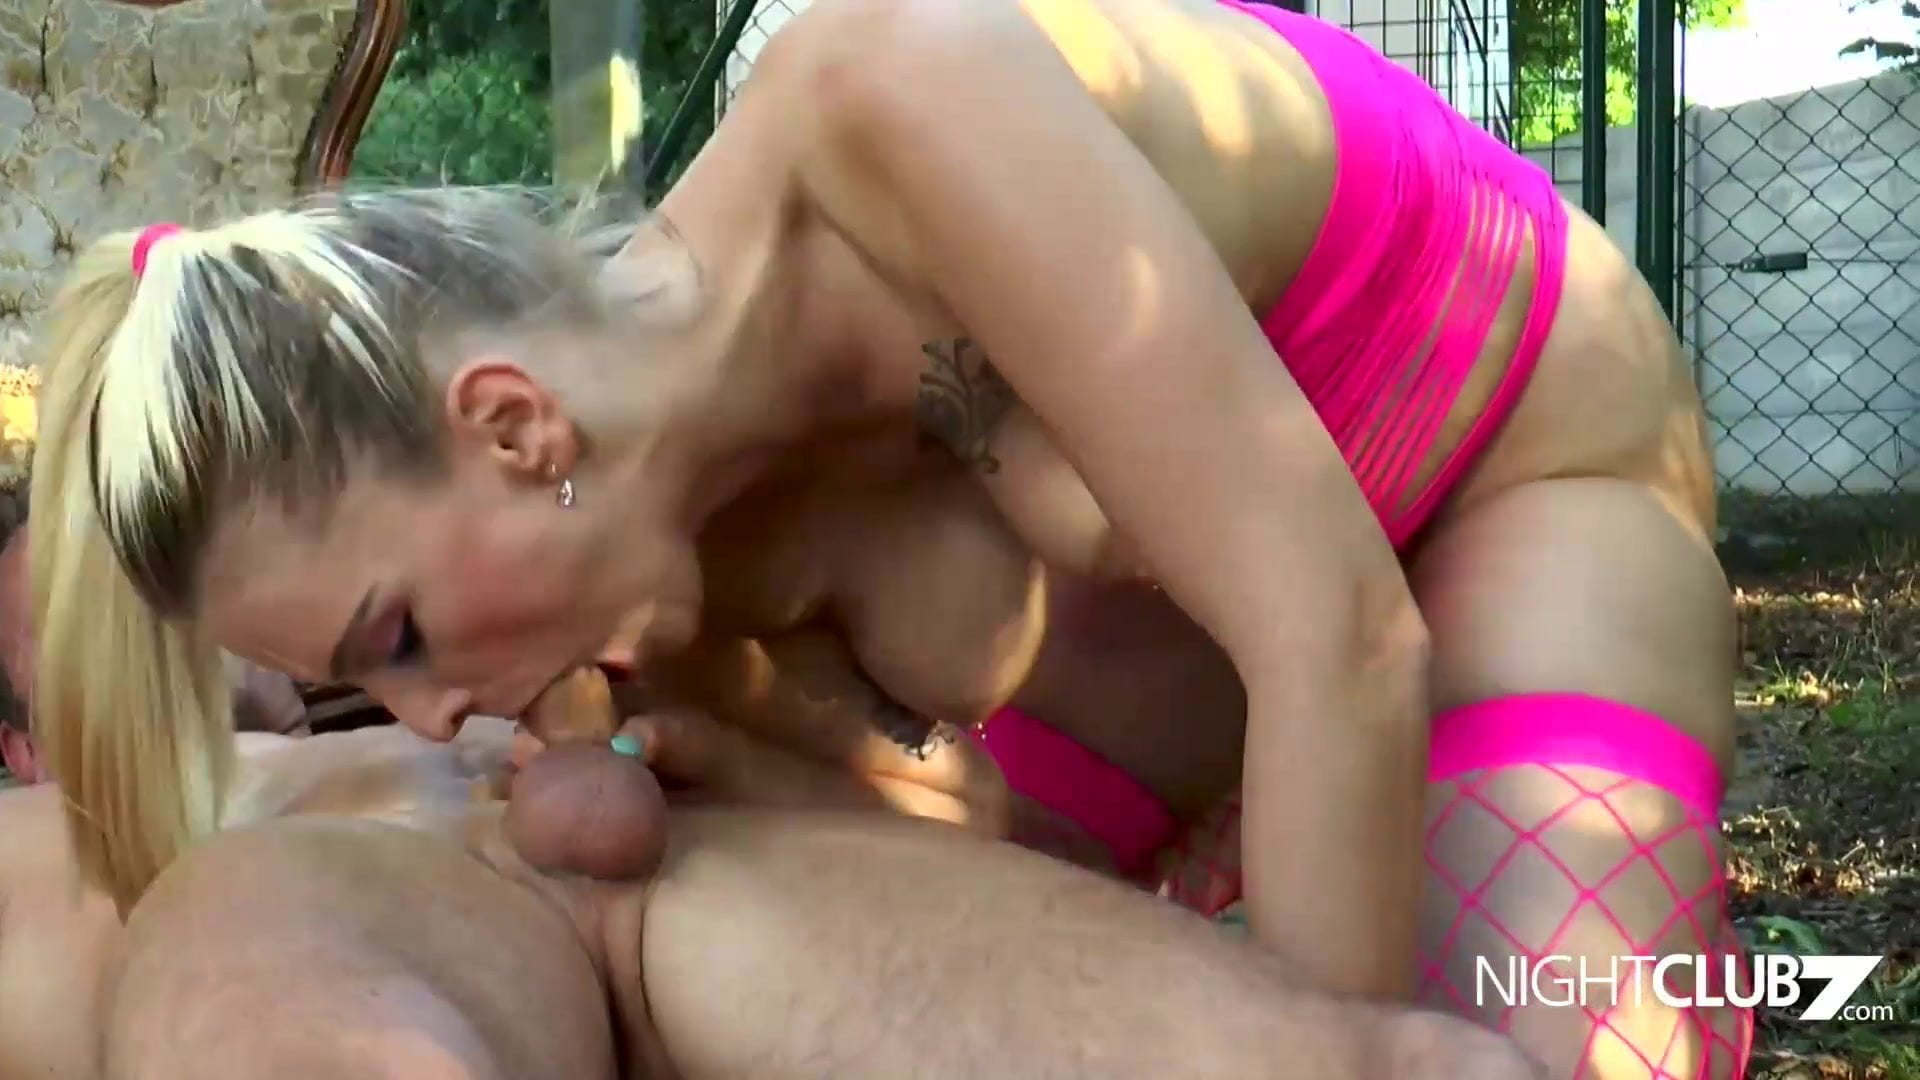 Pissen sex video online schon